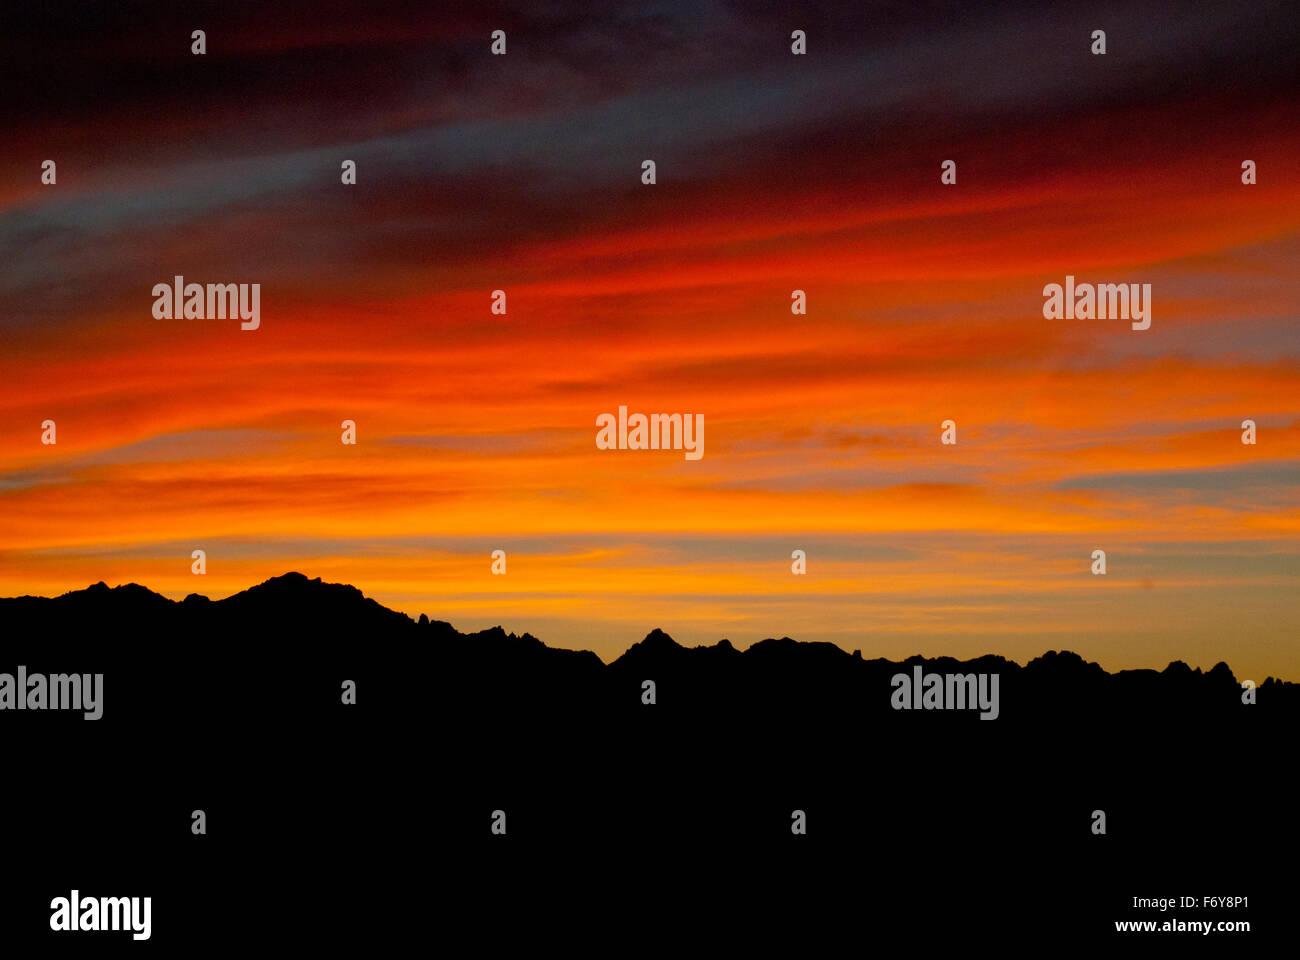 Sunset over the Sawtooth Mountains, Idaho - Stock Image